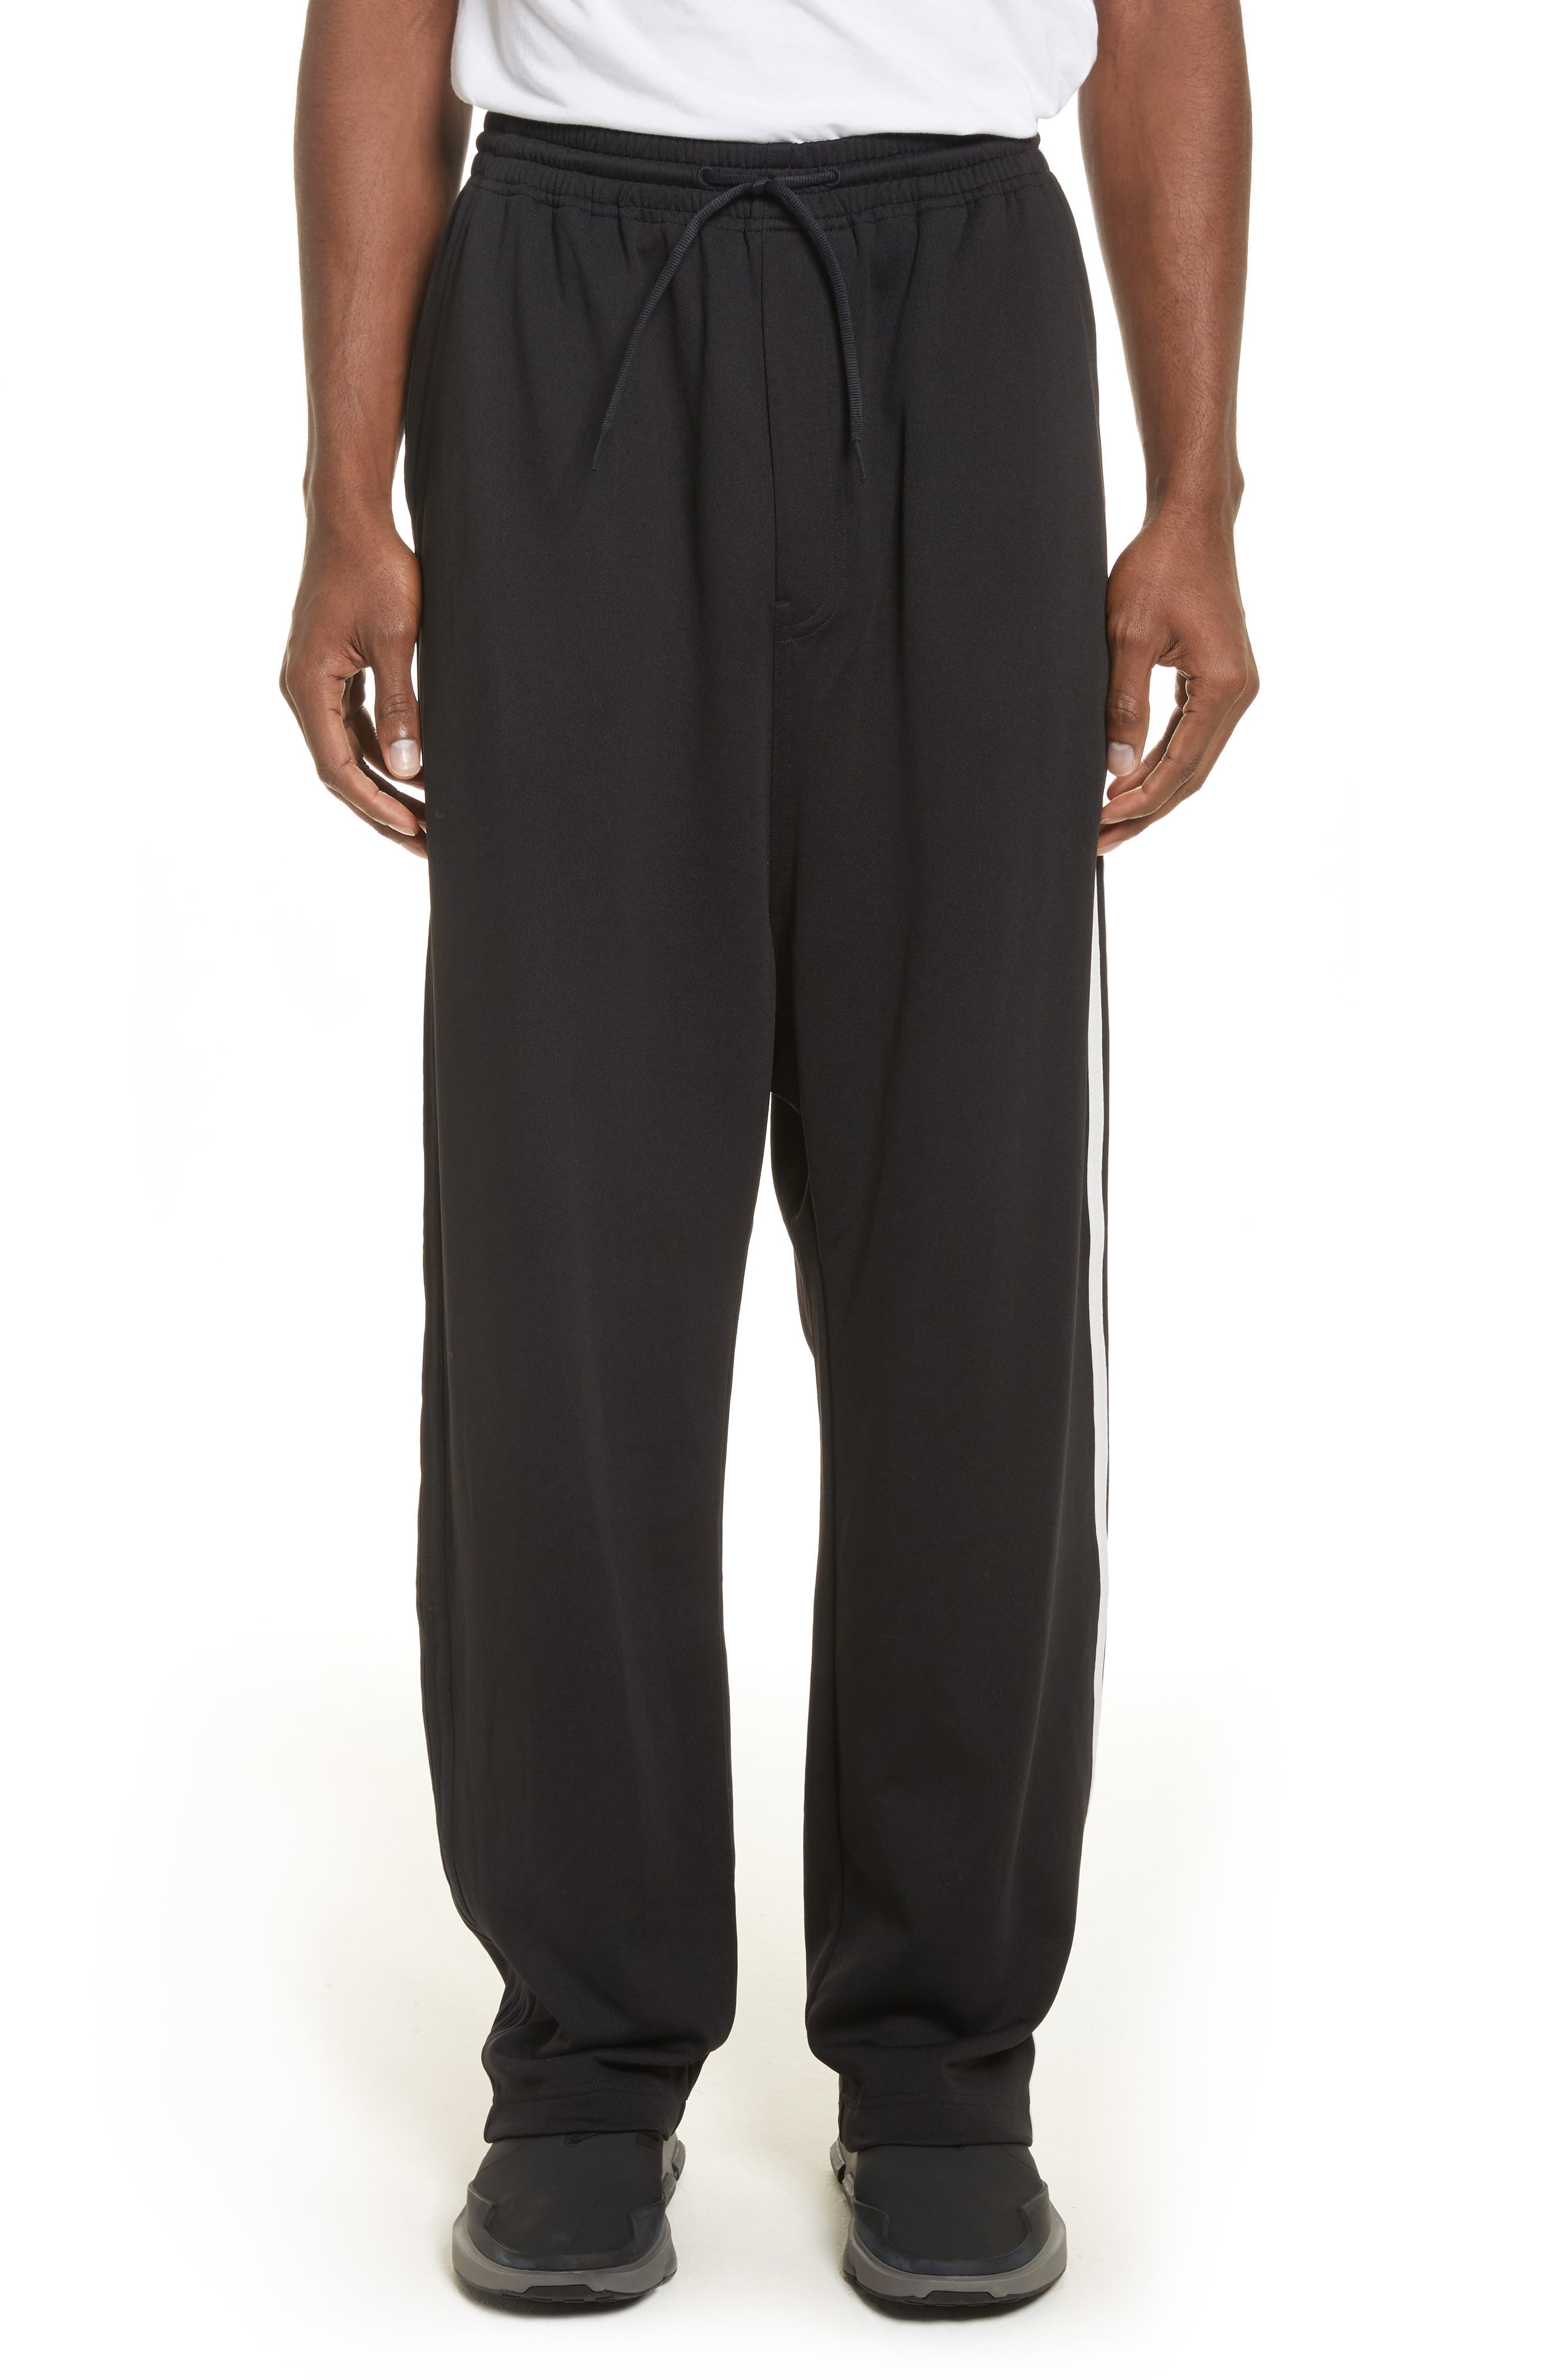 x adidas Wide Leg Track Pants,                             Main thumbnail 1, color,                             001